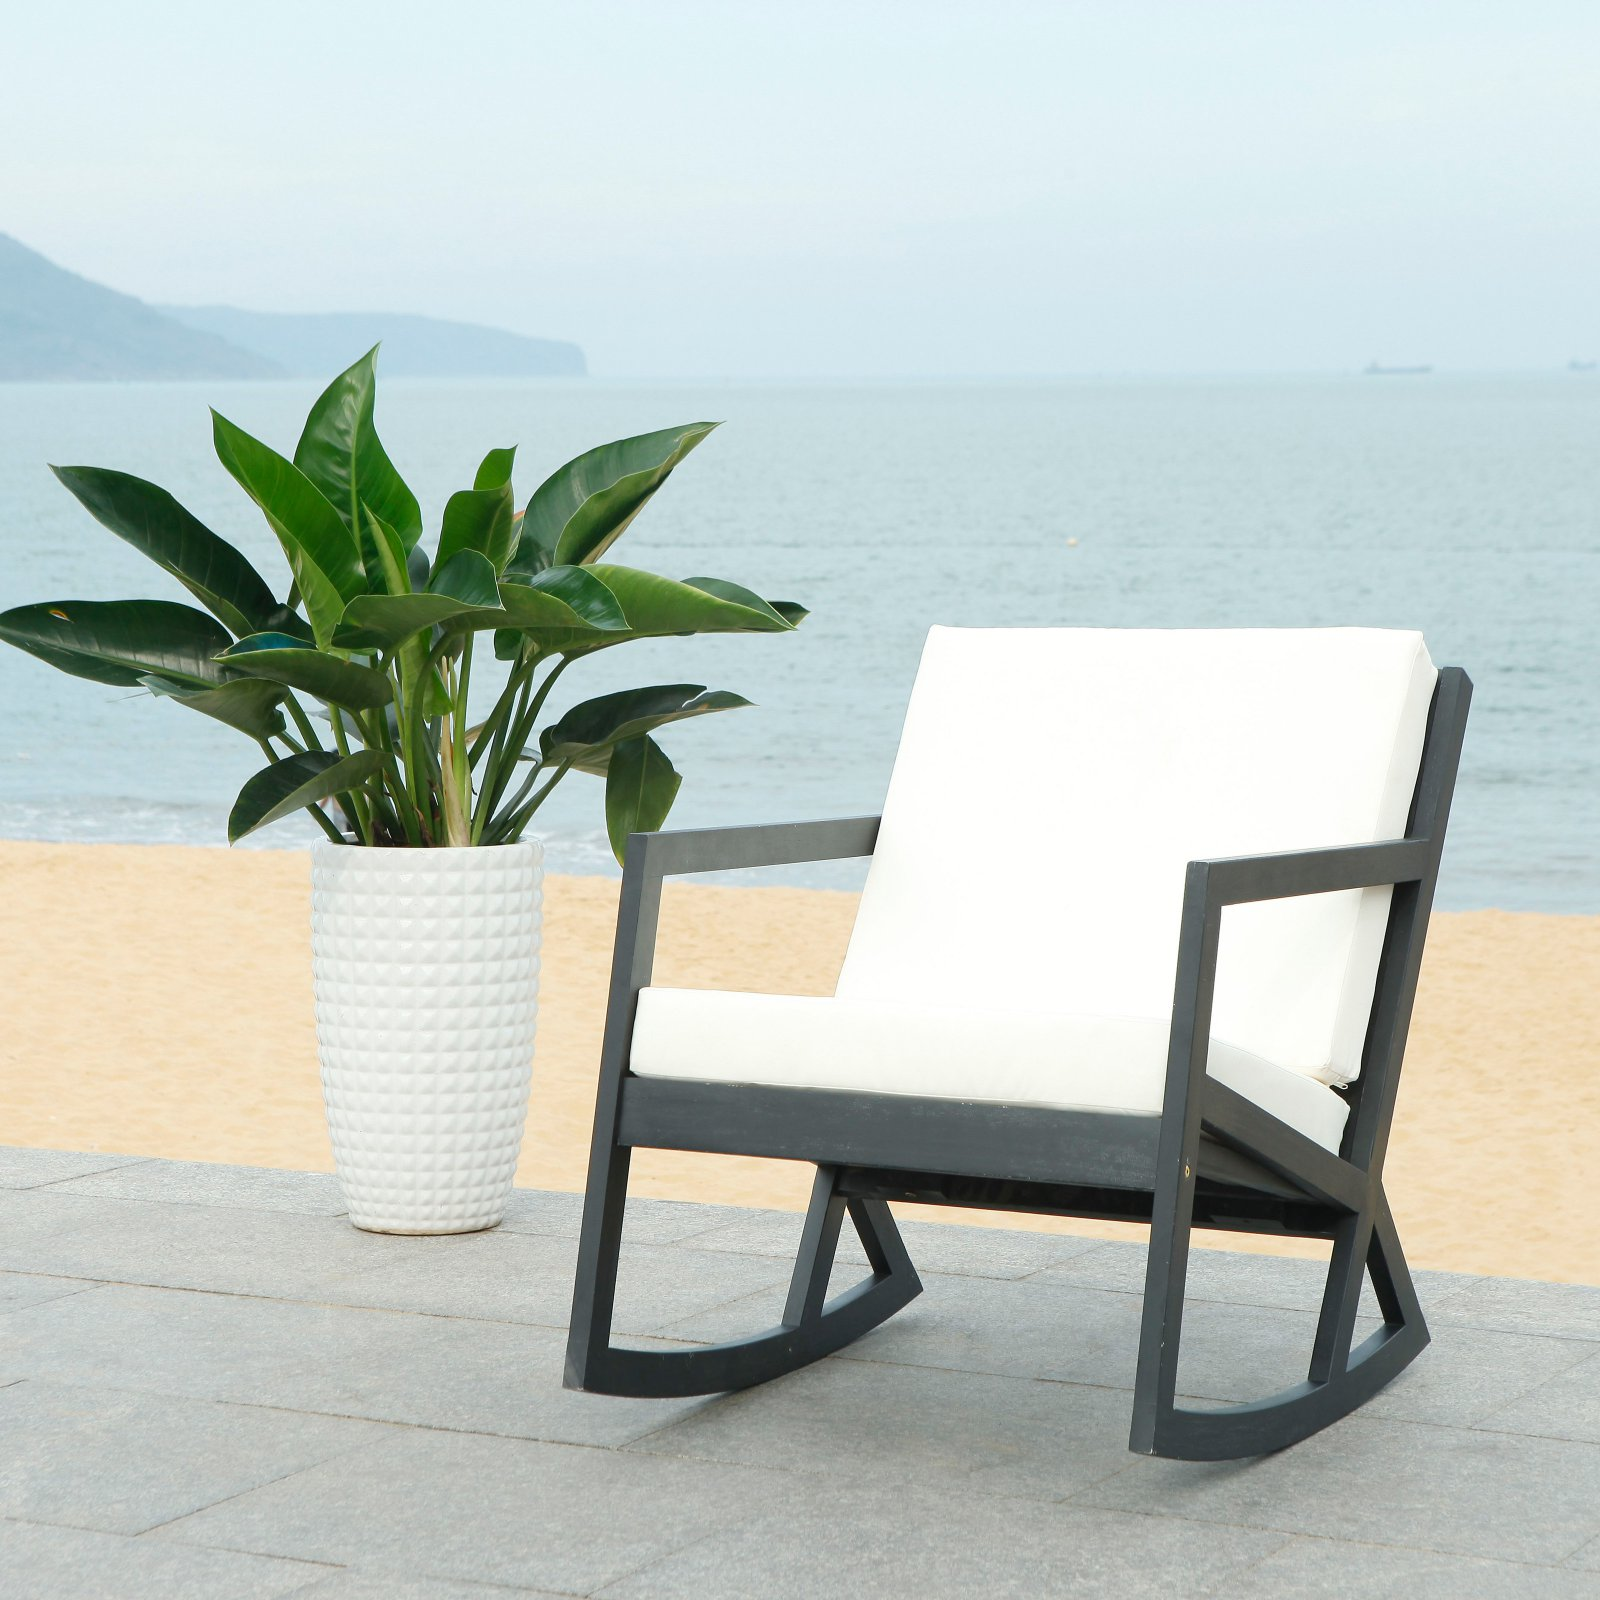 Safavieh Vernon Indoor/Outdoor Modern Rocking Chair with Cushion